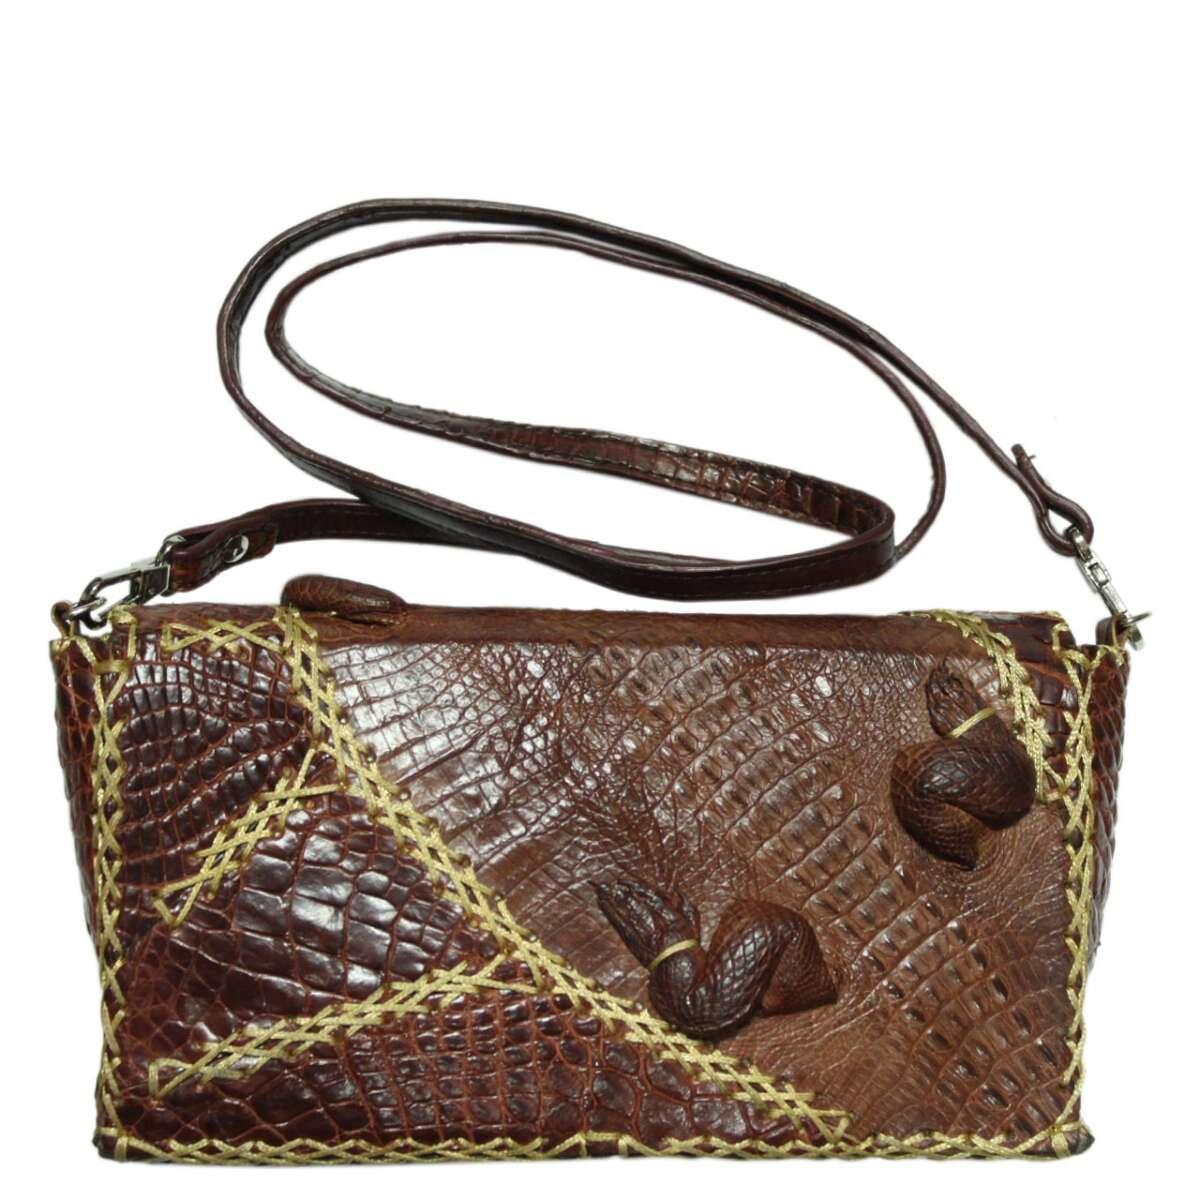 Túi đeo chéo nữ da cá sấu S123a